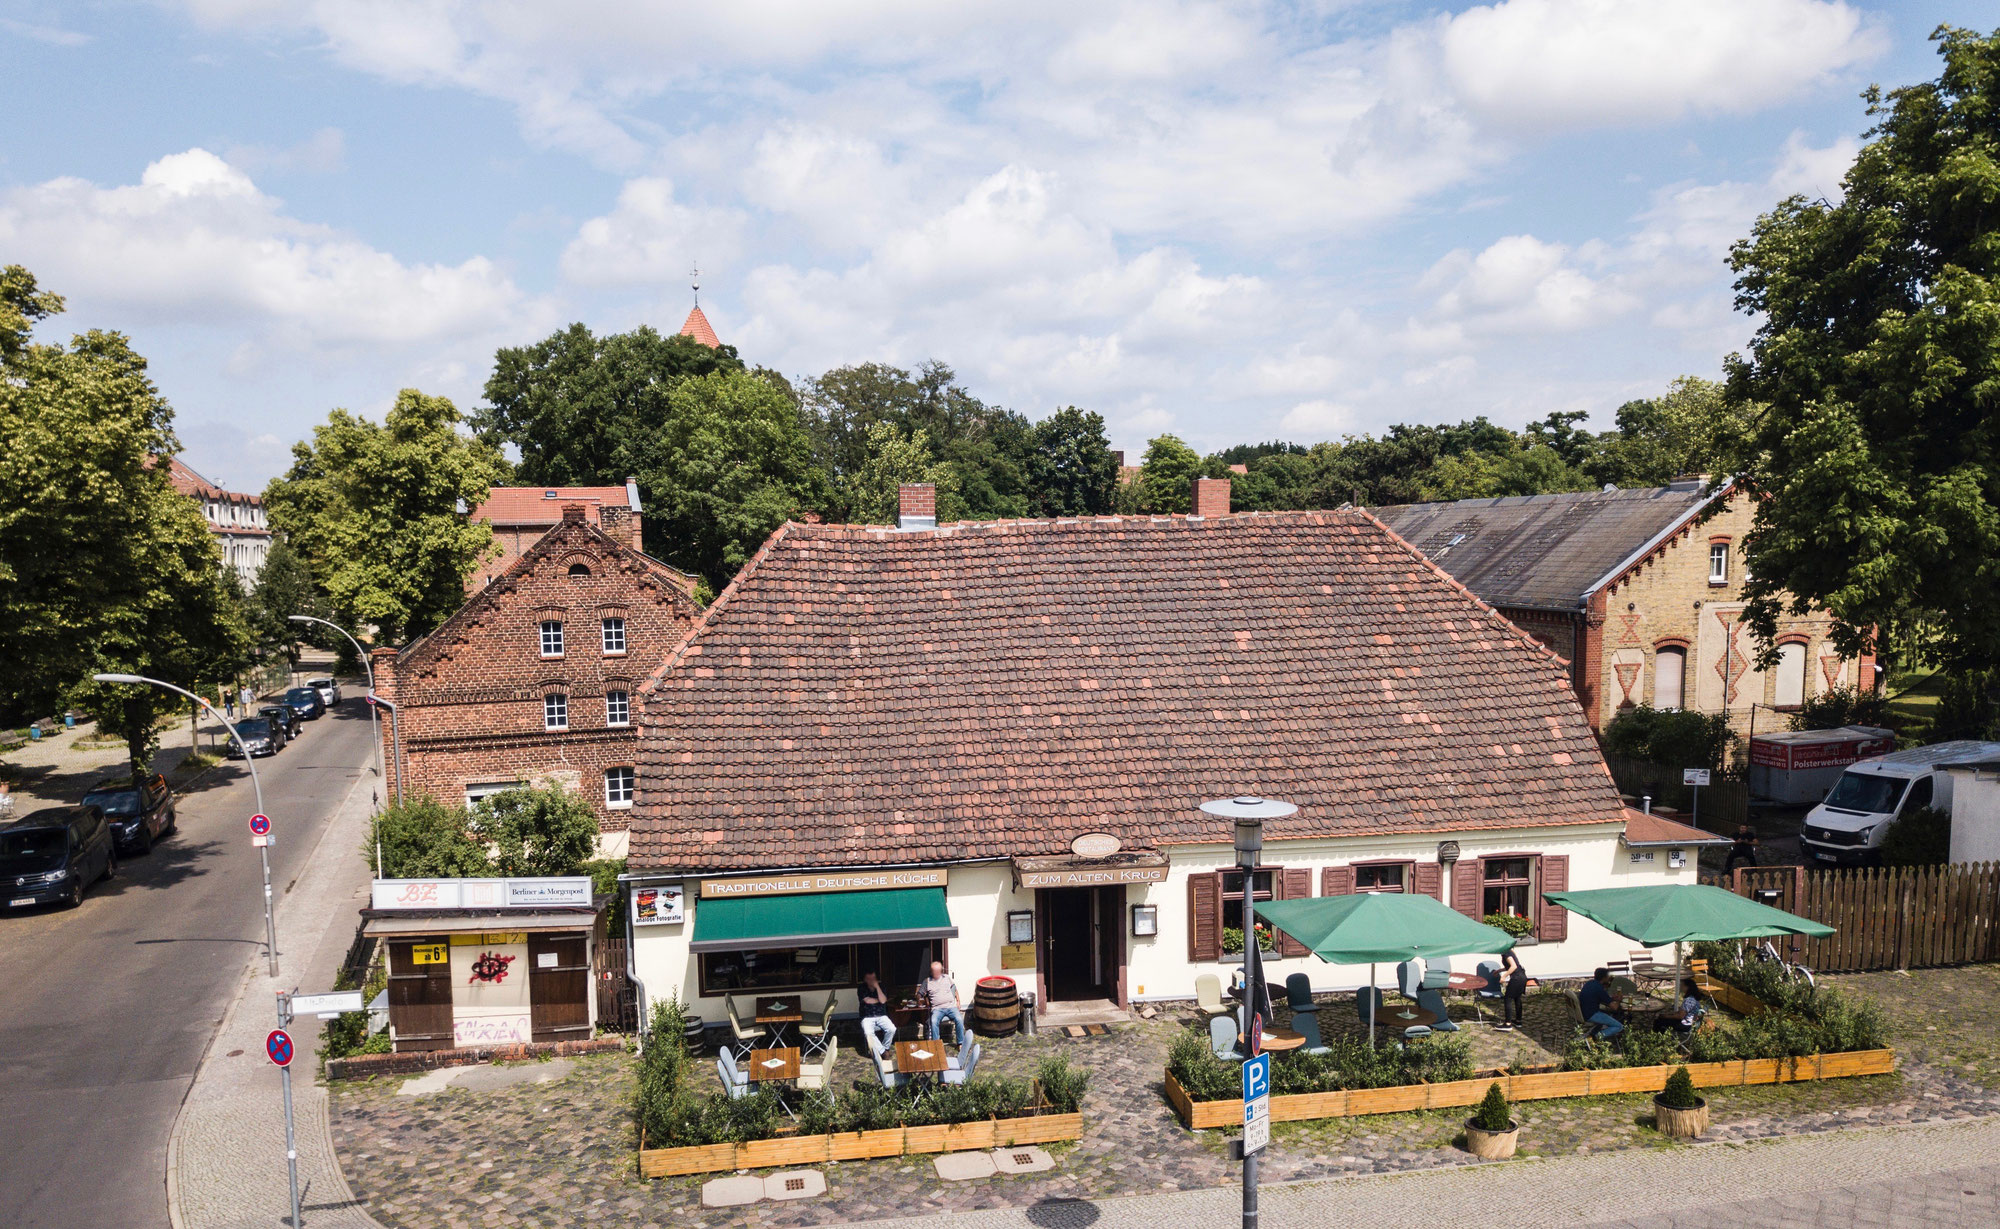 Restaurant Zum Alten Krug Restaurant Zum Alten Krug